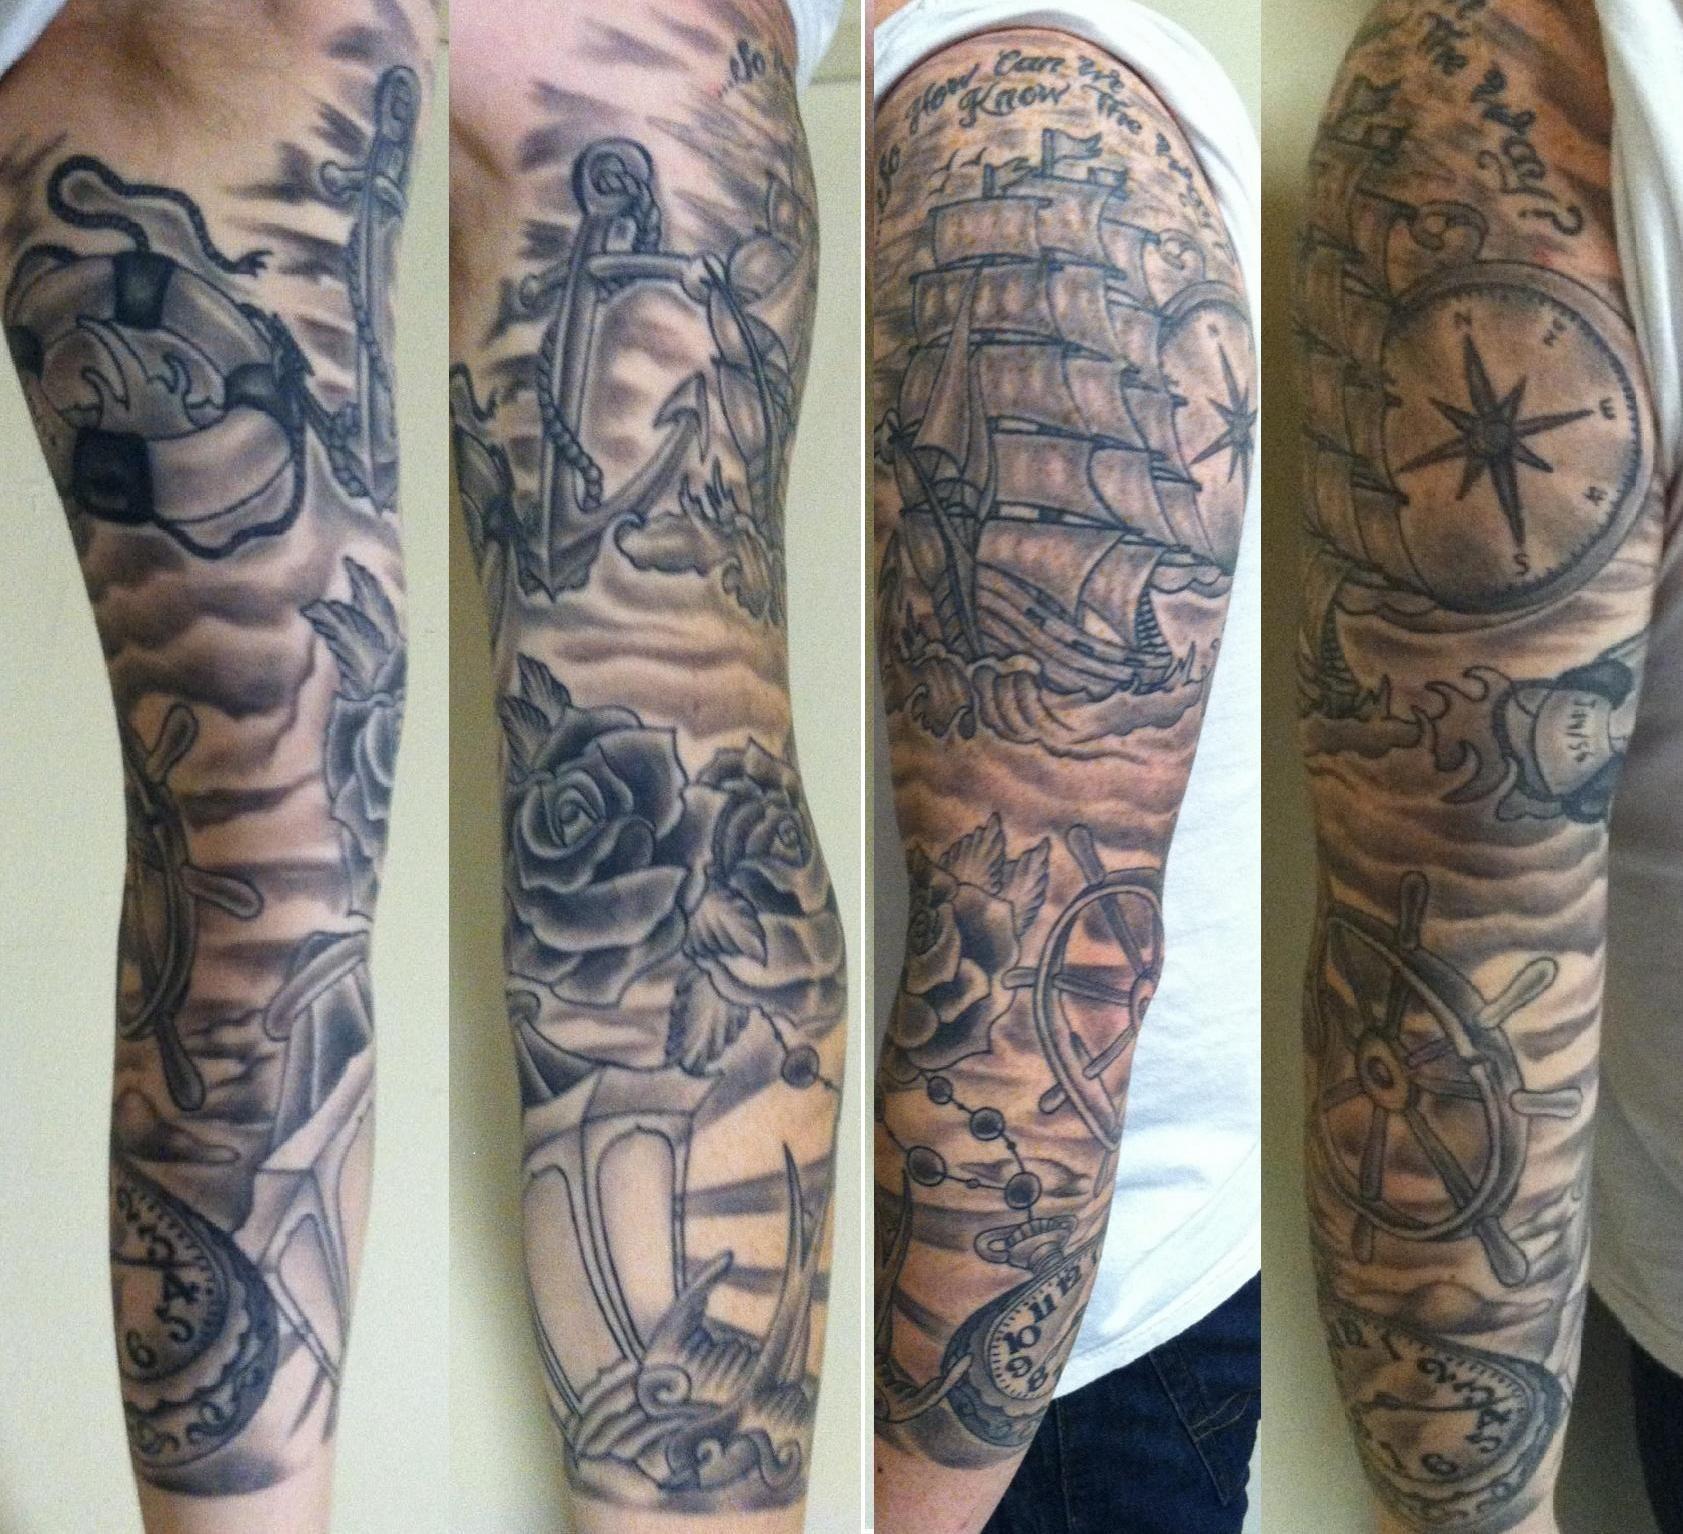 Black Grey Sleeve Tattoo Ideas: Black & Gray Sleeve By John Schmidt At Tattoo 42 (Portland